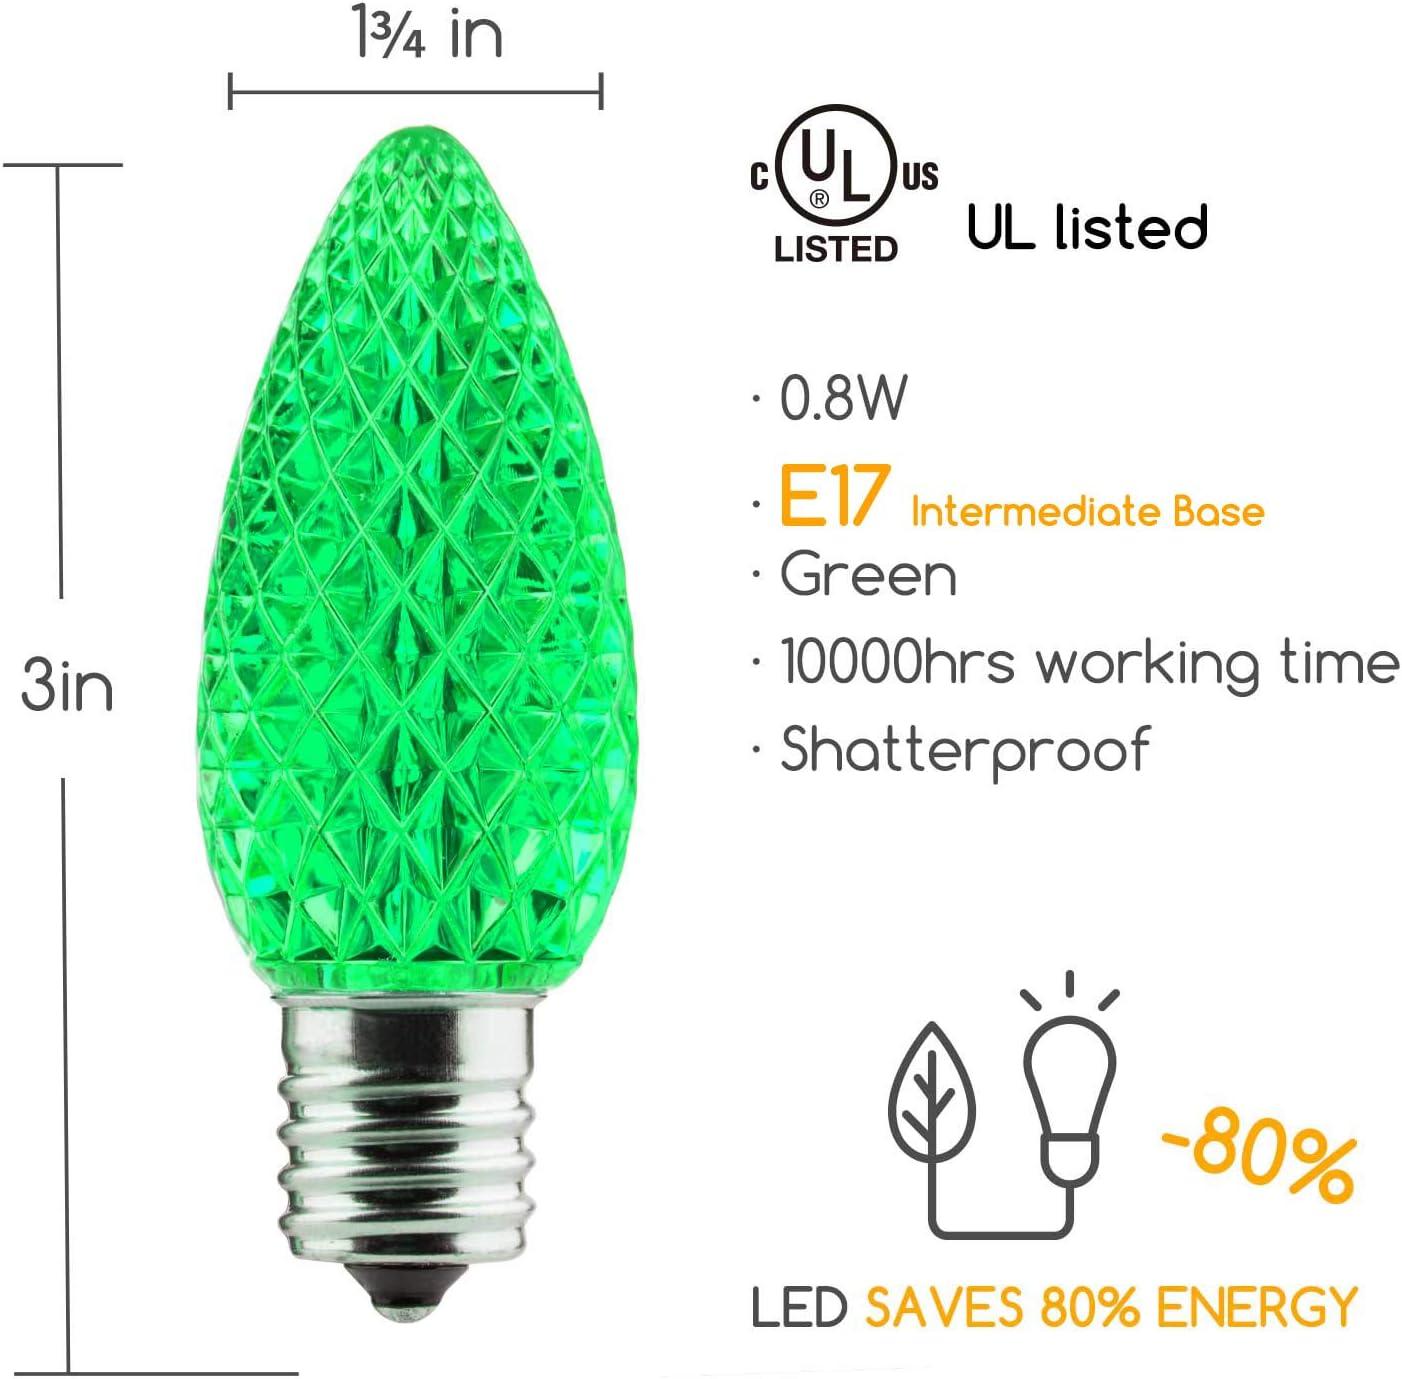 Warm White LEDs E17 Intermediate Base C9 Shatterproof LED Bulb for Christmas String Light Brightown 50 Pack C9 LED Replacement Christmas Light Bulb Commercial Grade Dimmable Bulbs 2 Diode